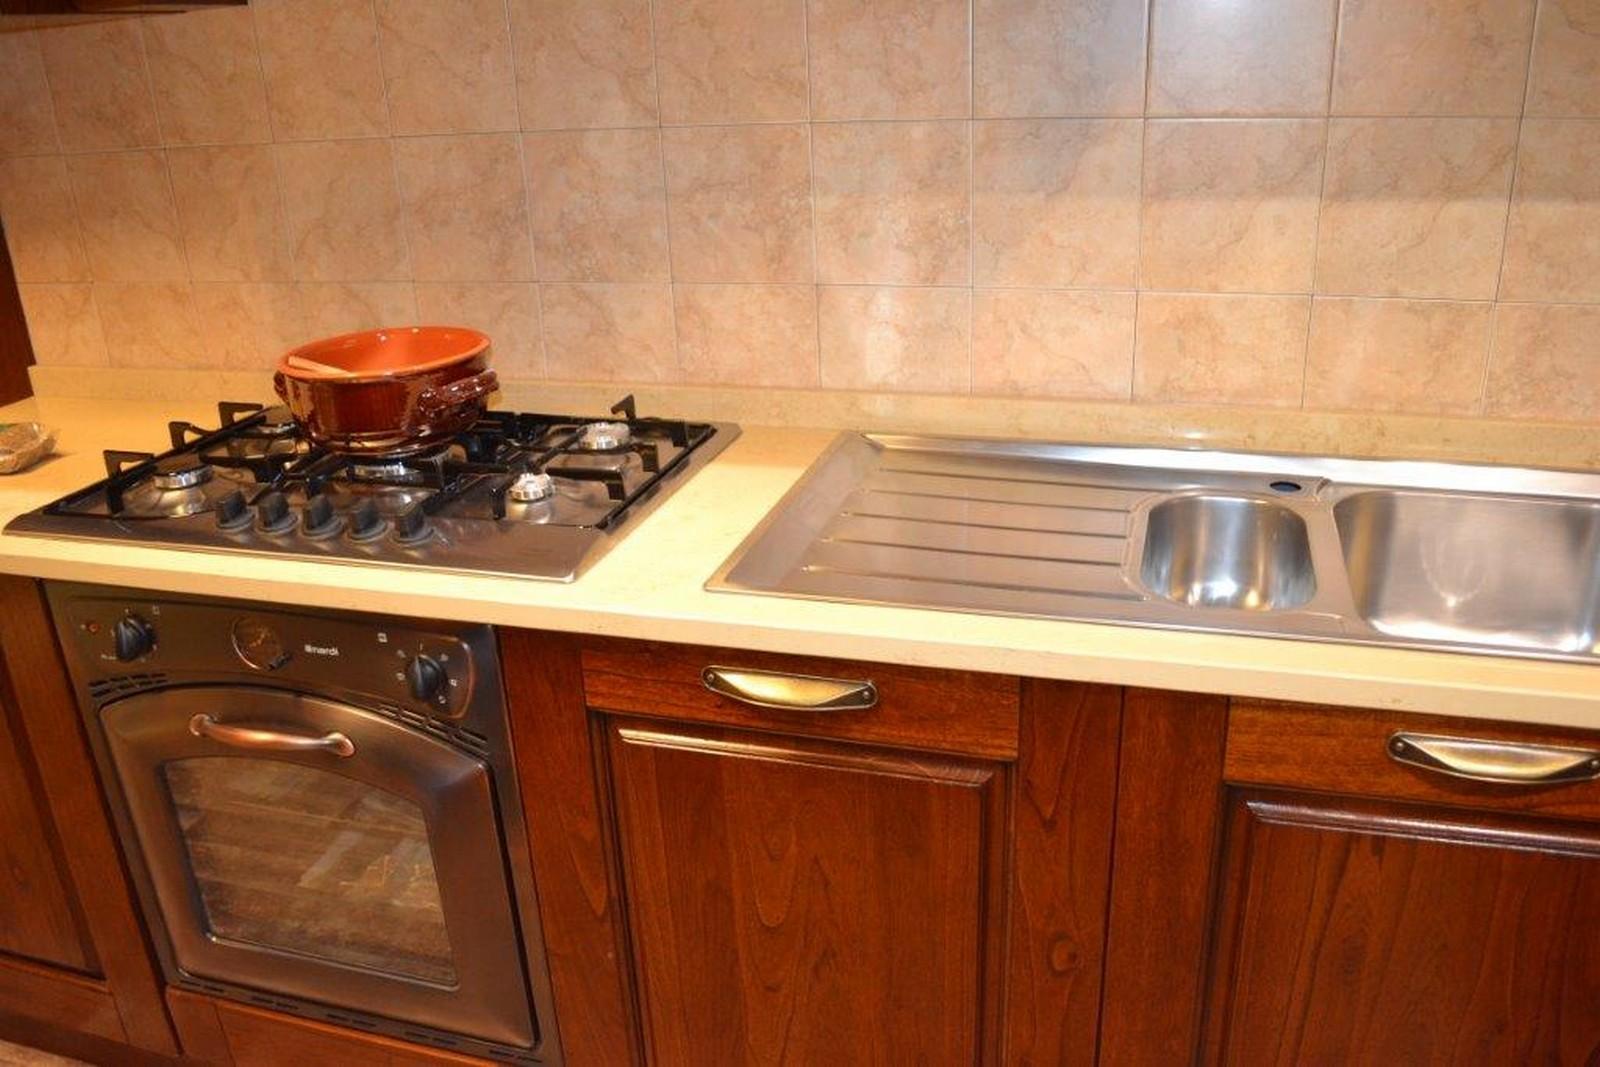 Cucina verona arredo3 centro dell 39 arredamento di savona for Centro dell arredamento savona